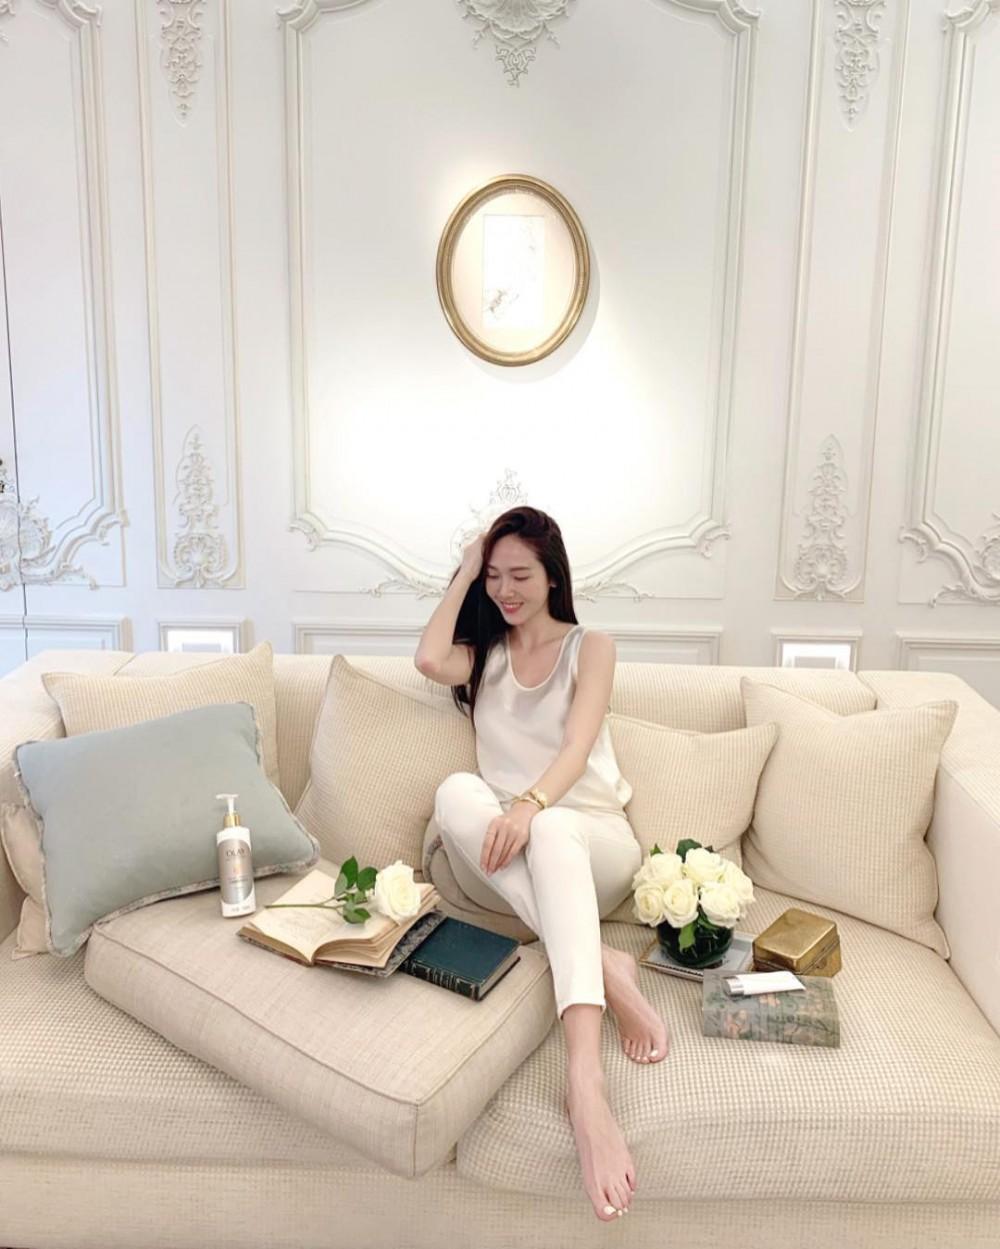 Jessica.syj's Instagram